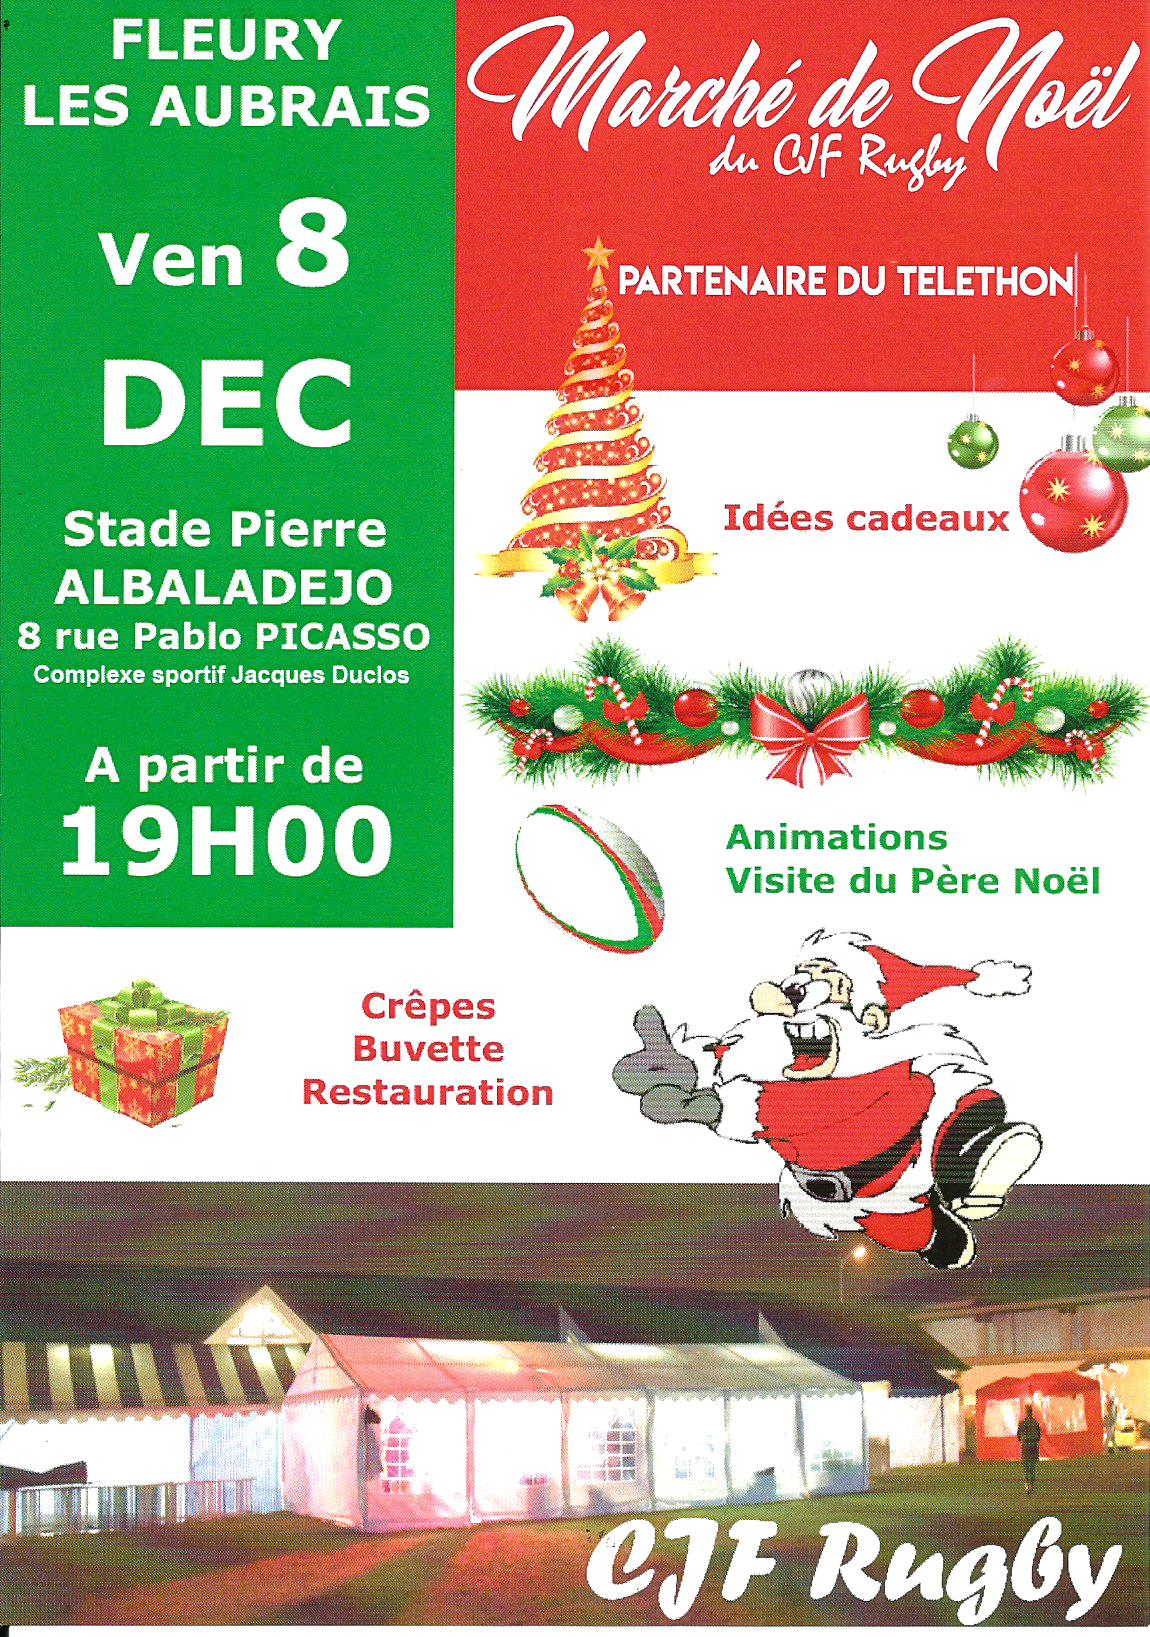 Scan Affiche CJF RUGBY Marché de Noël 2017 (08.12.2017).jpg